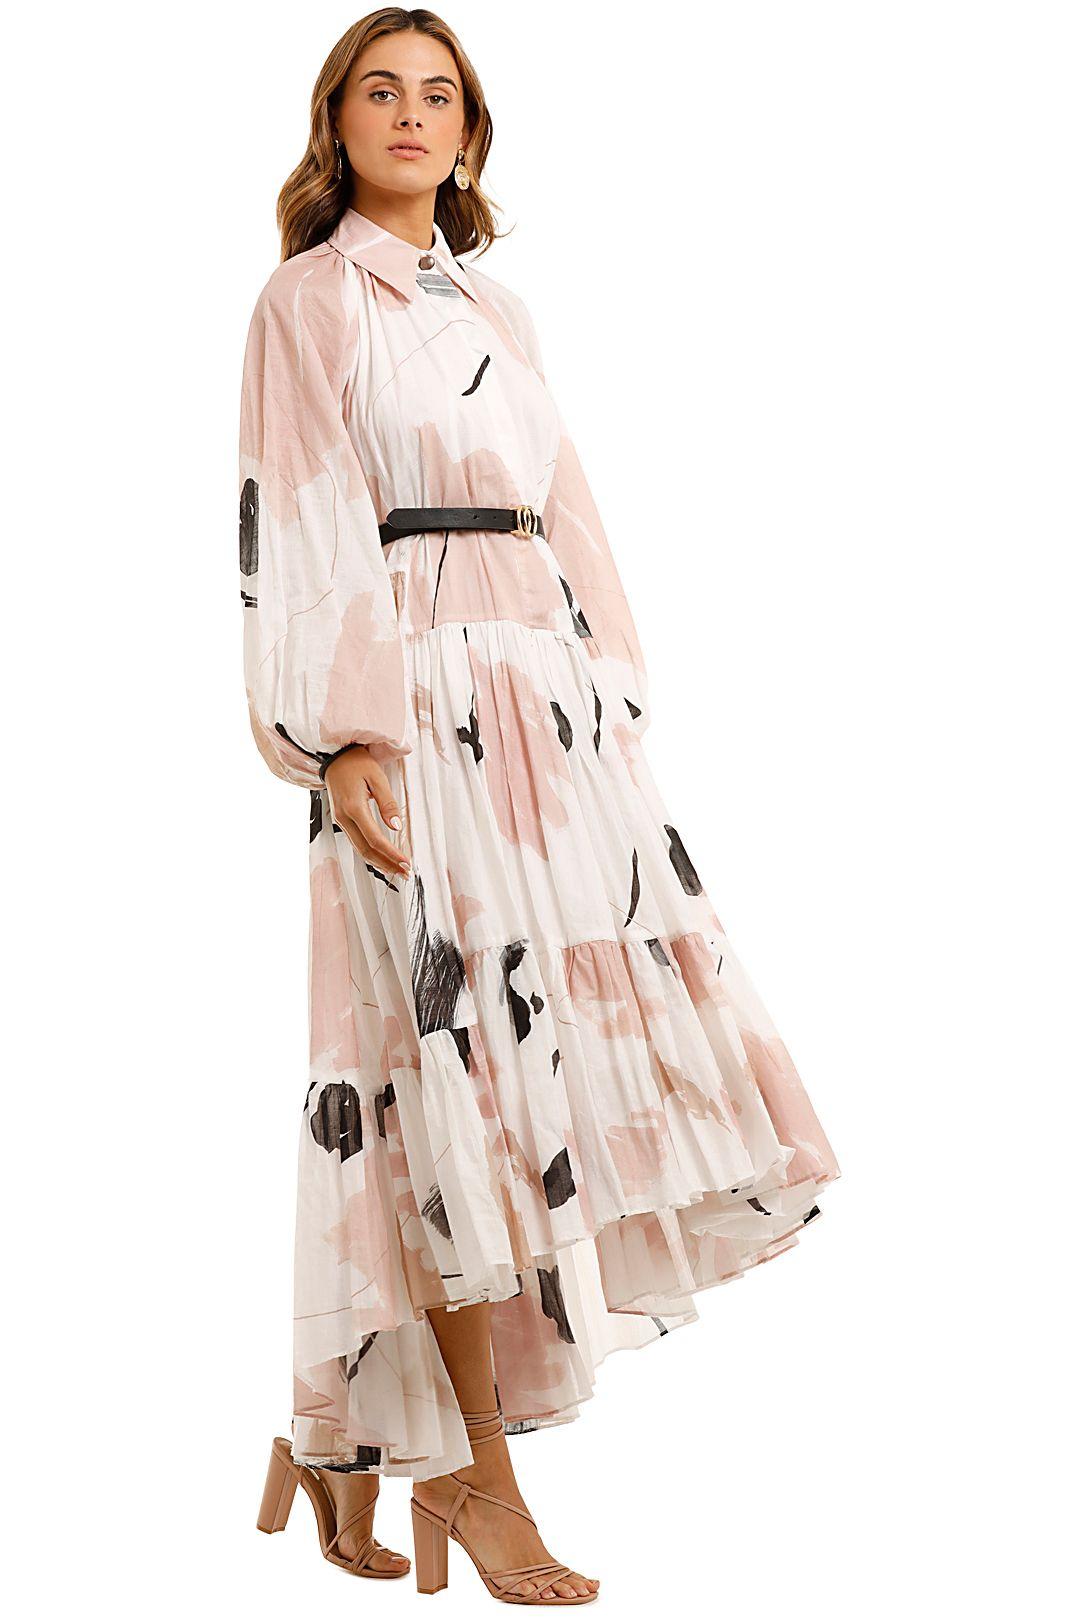 AJE Serenity Smock Maxi Dress Long Sleeves